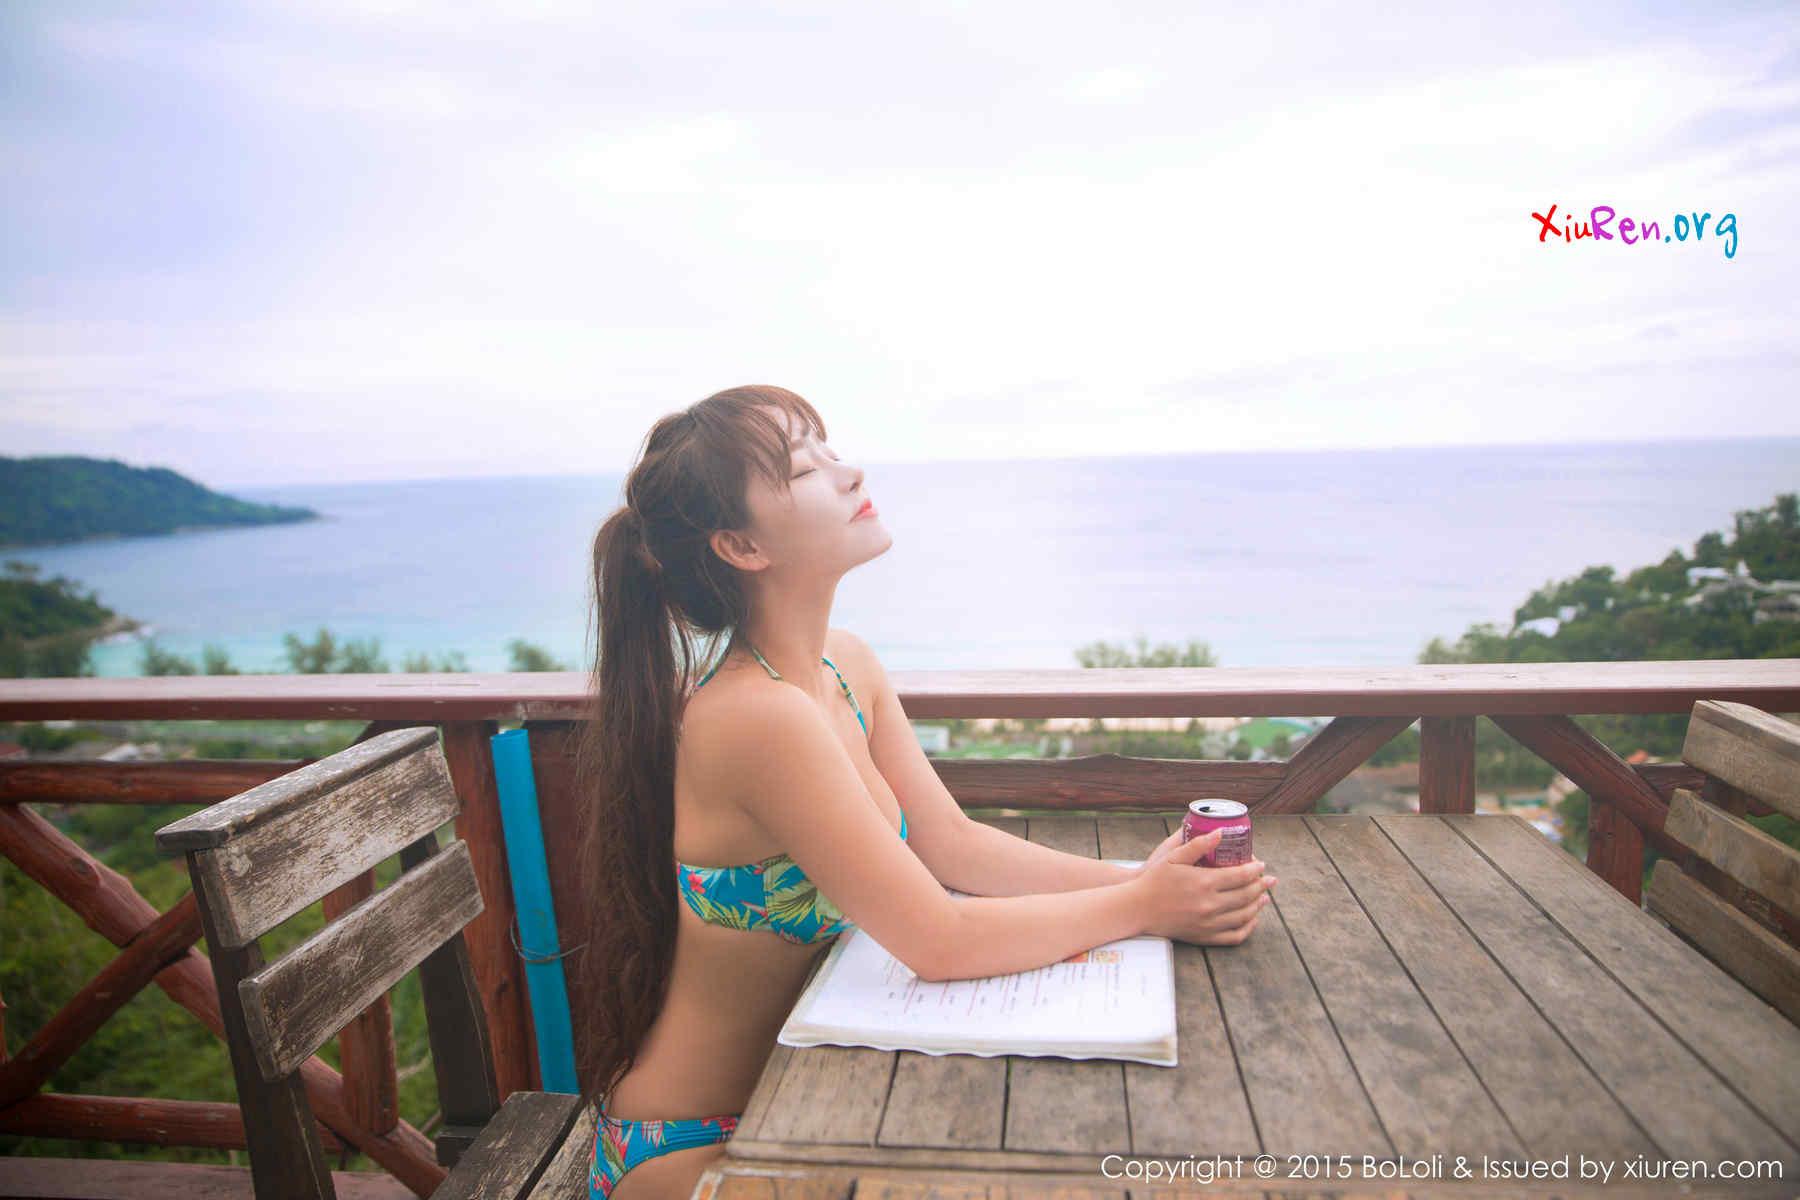 PhimVu-Blog-0039.jpg